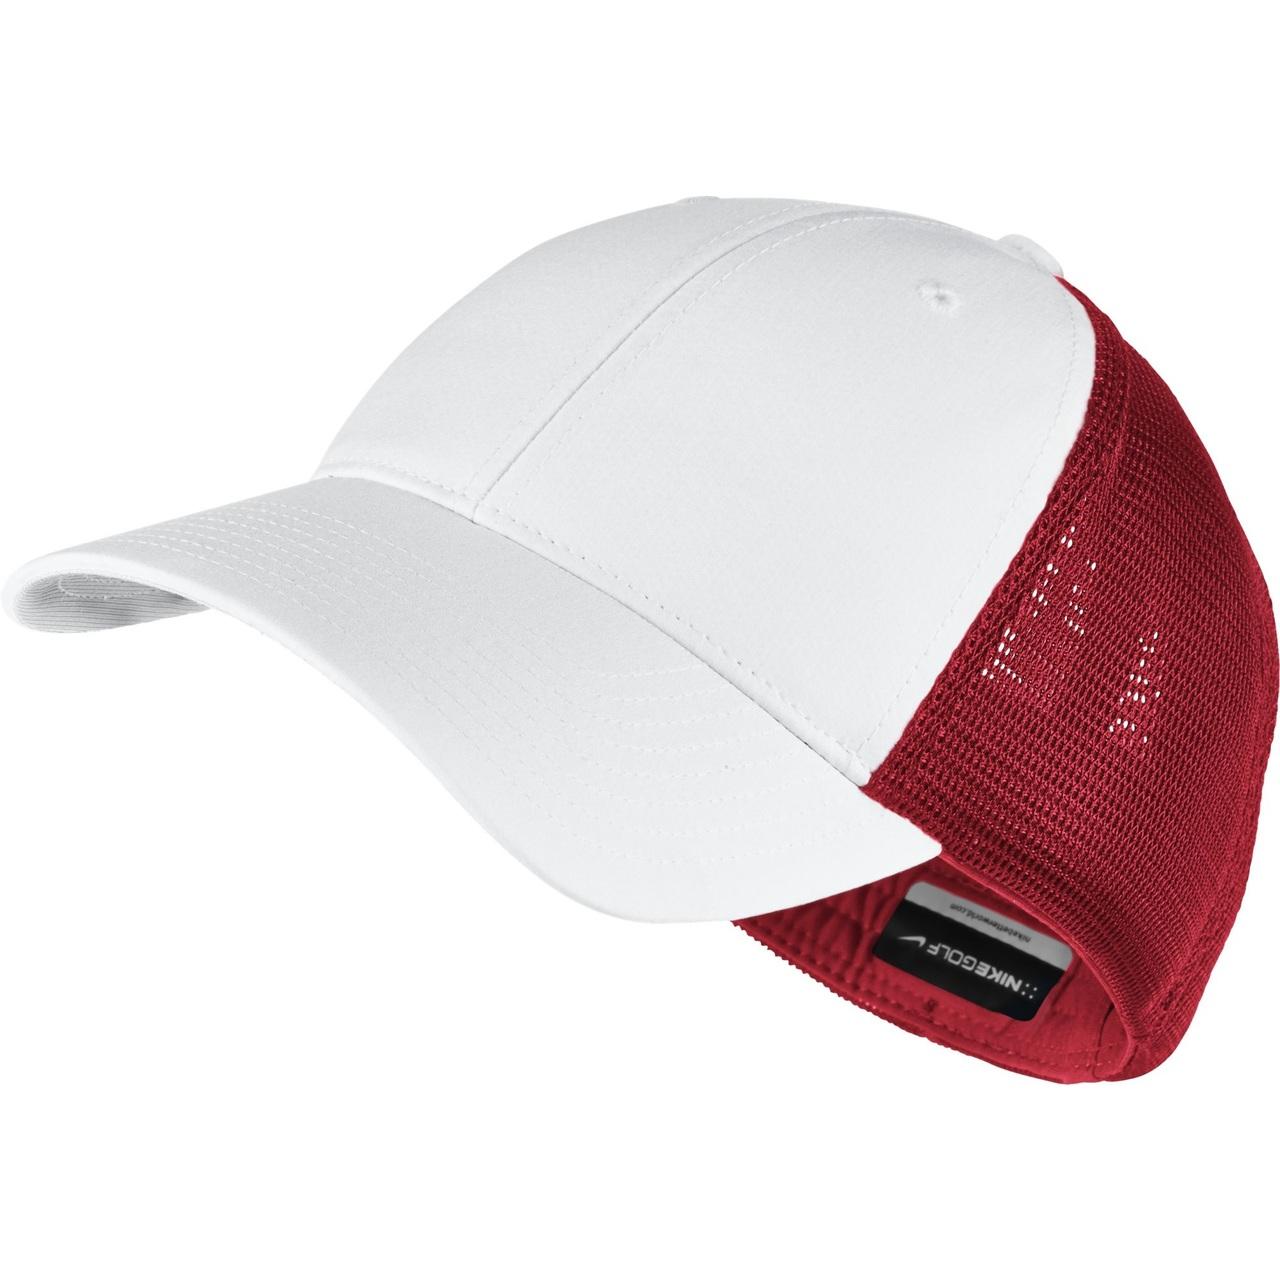 6f338fa9efc Nike Golf CLOSEOUT Legacy 91 Mesh Custom Hat (University Red White) 727038-